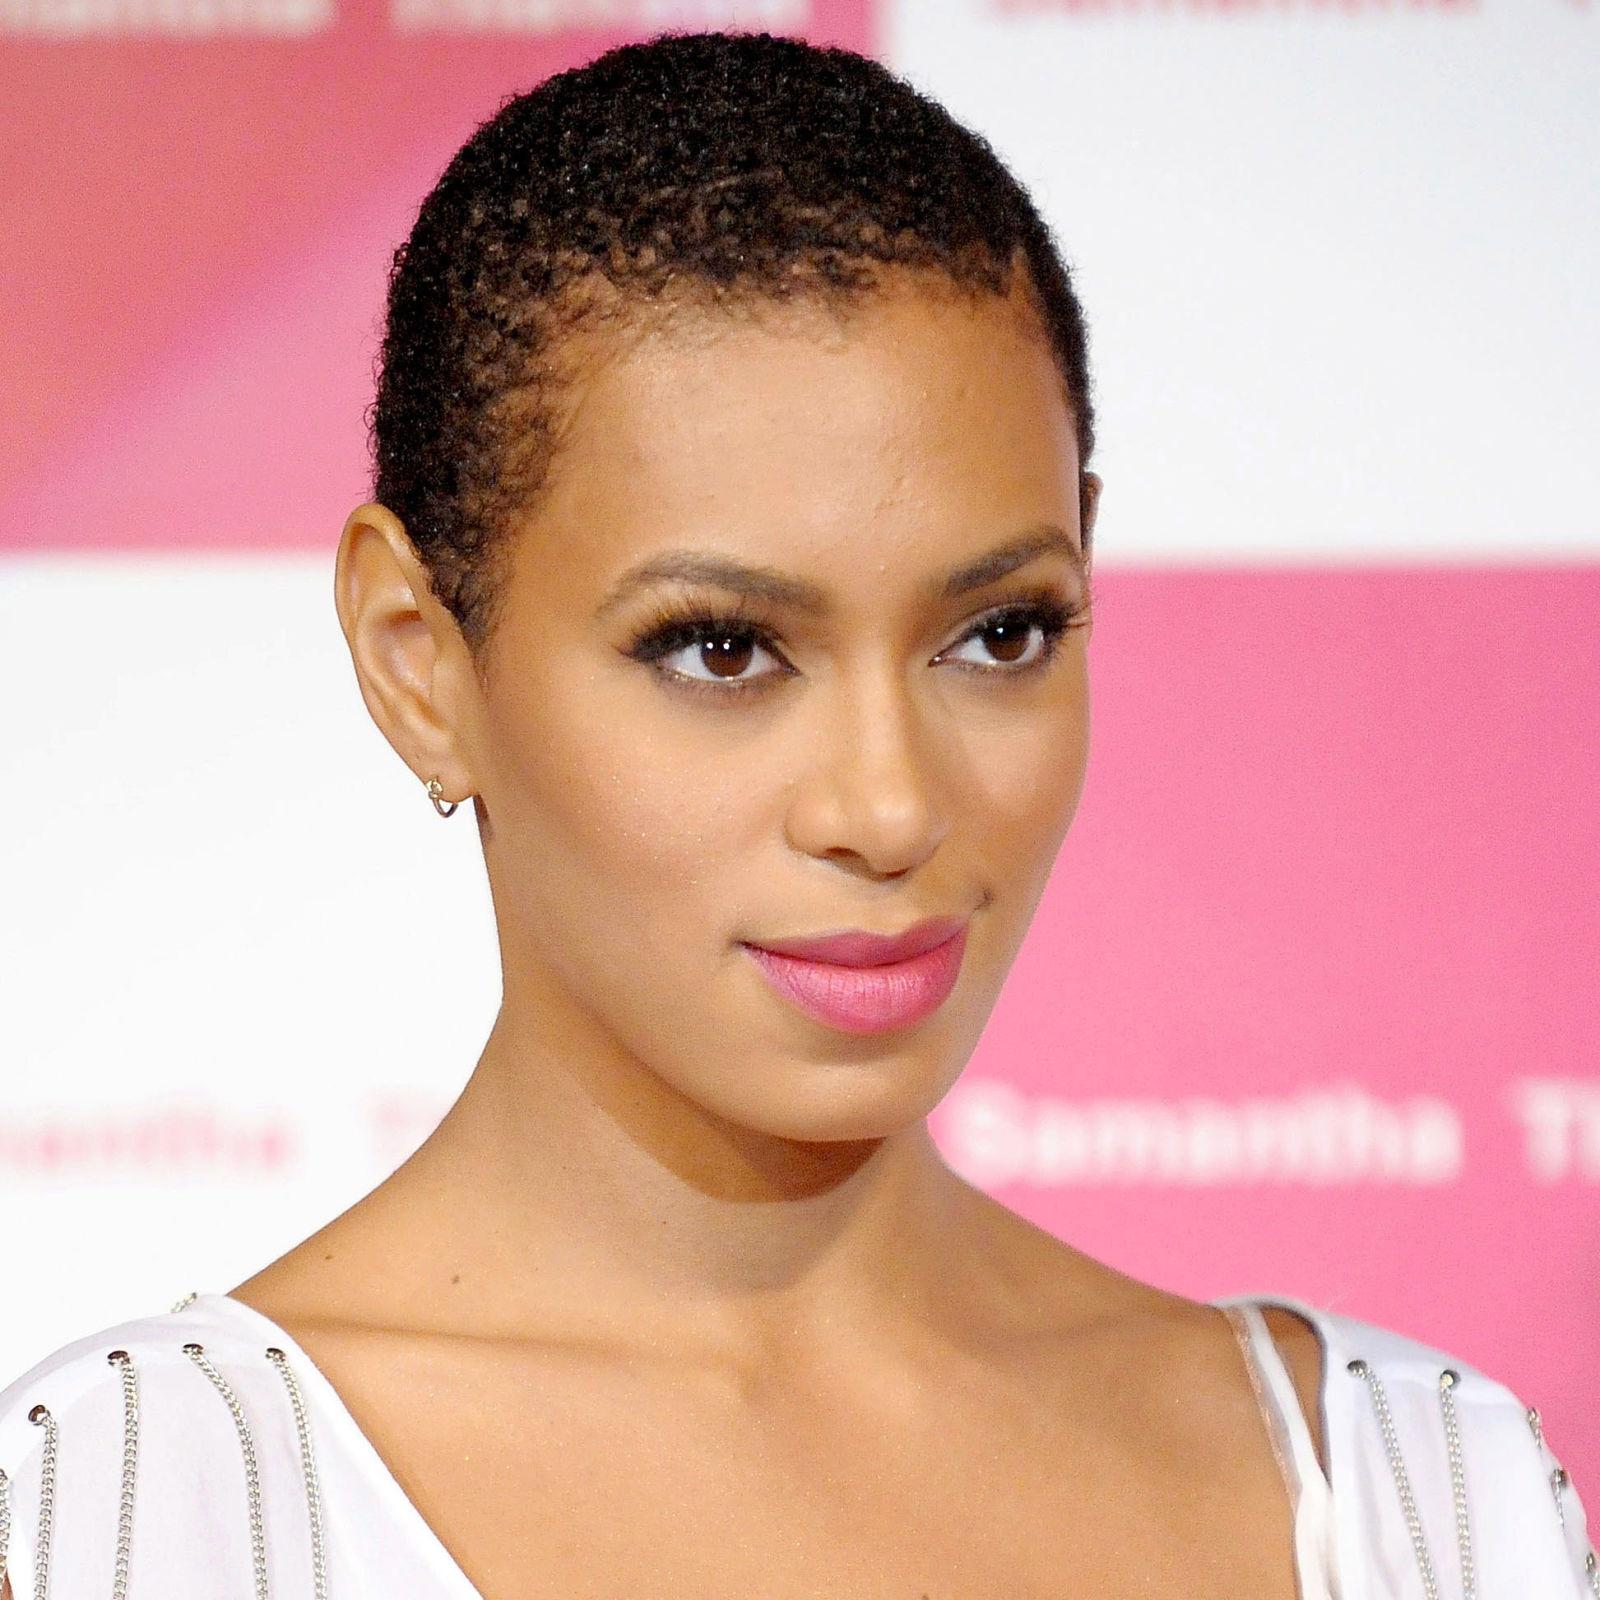 Prime Jazzy Black Women Short Hairstyles 2016 Hairstyles 2016 Hair Short Hairstyles For Black Women Fulllsitofus